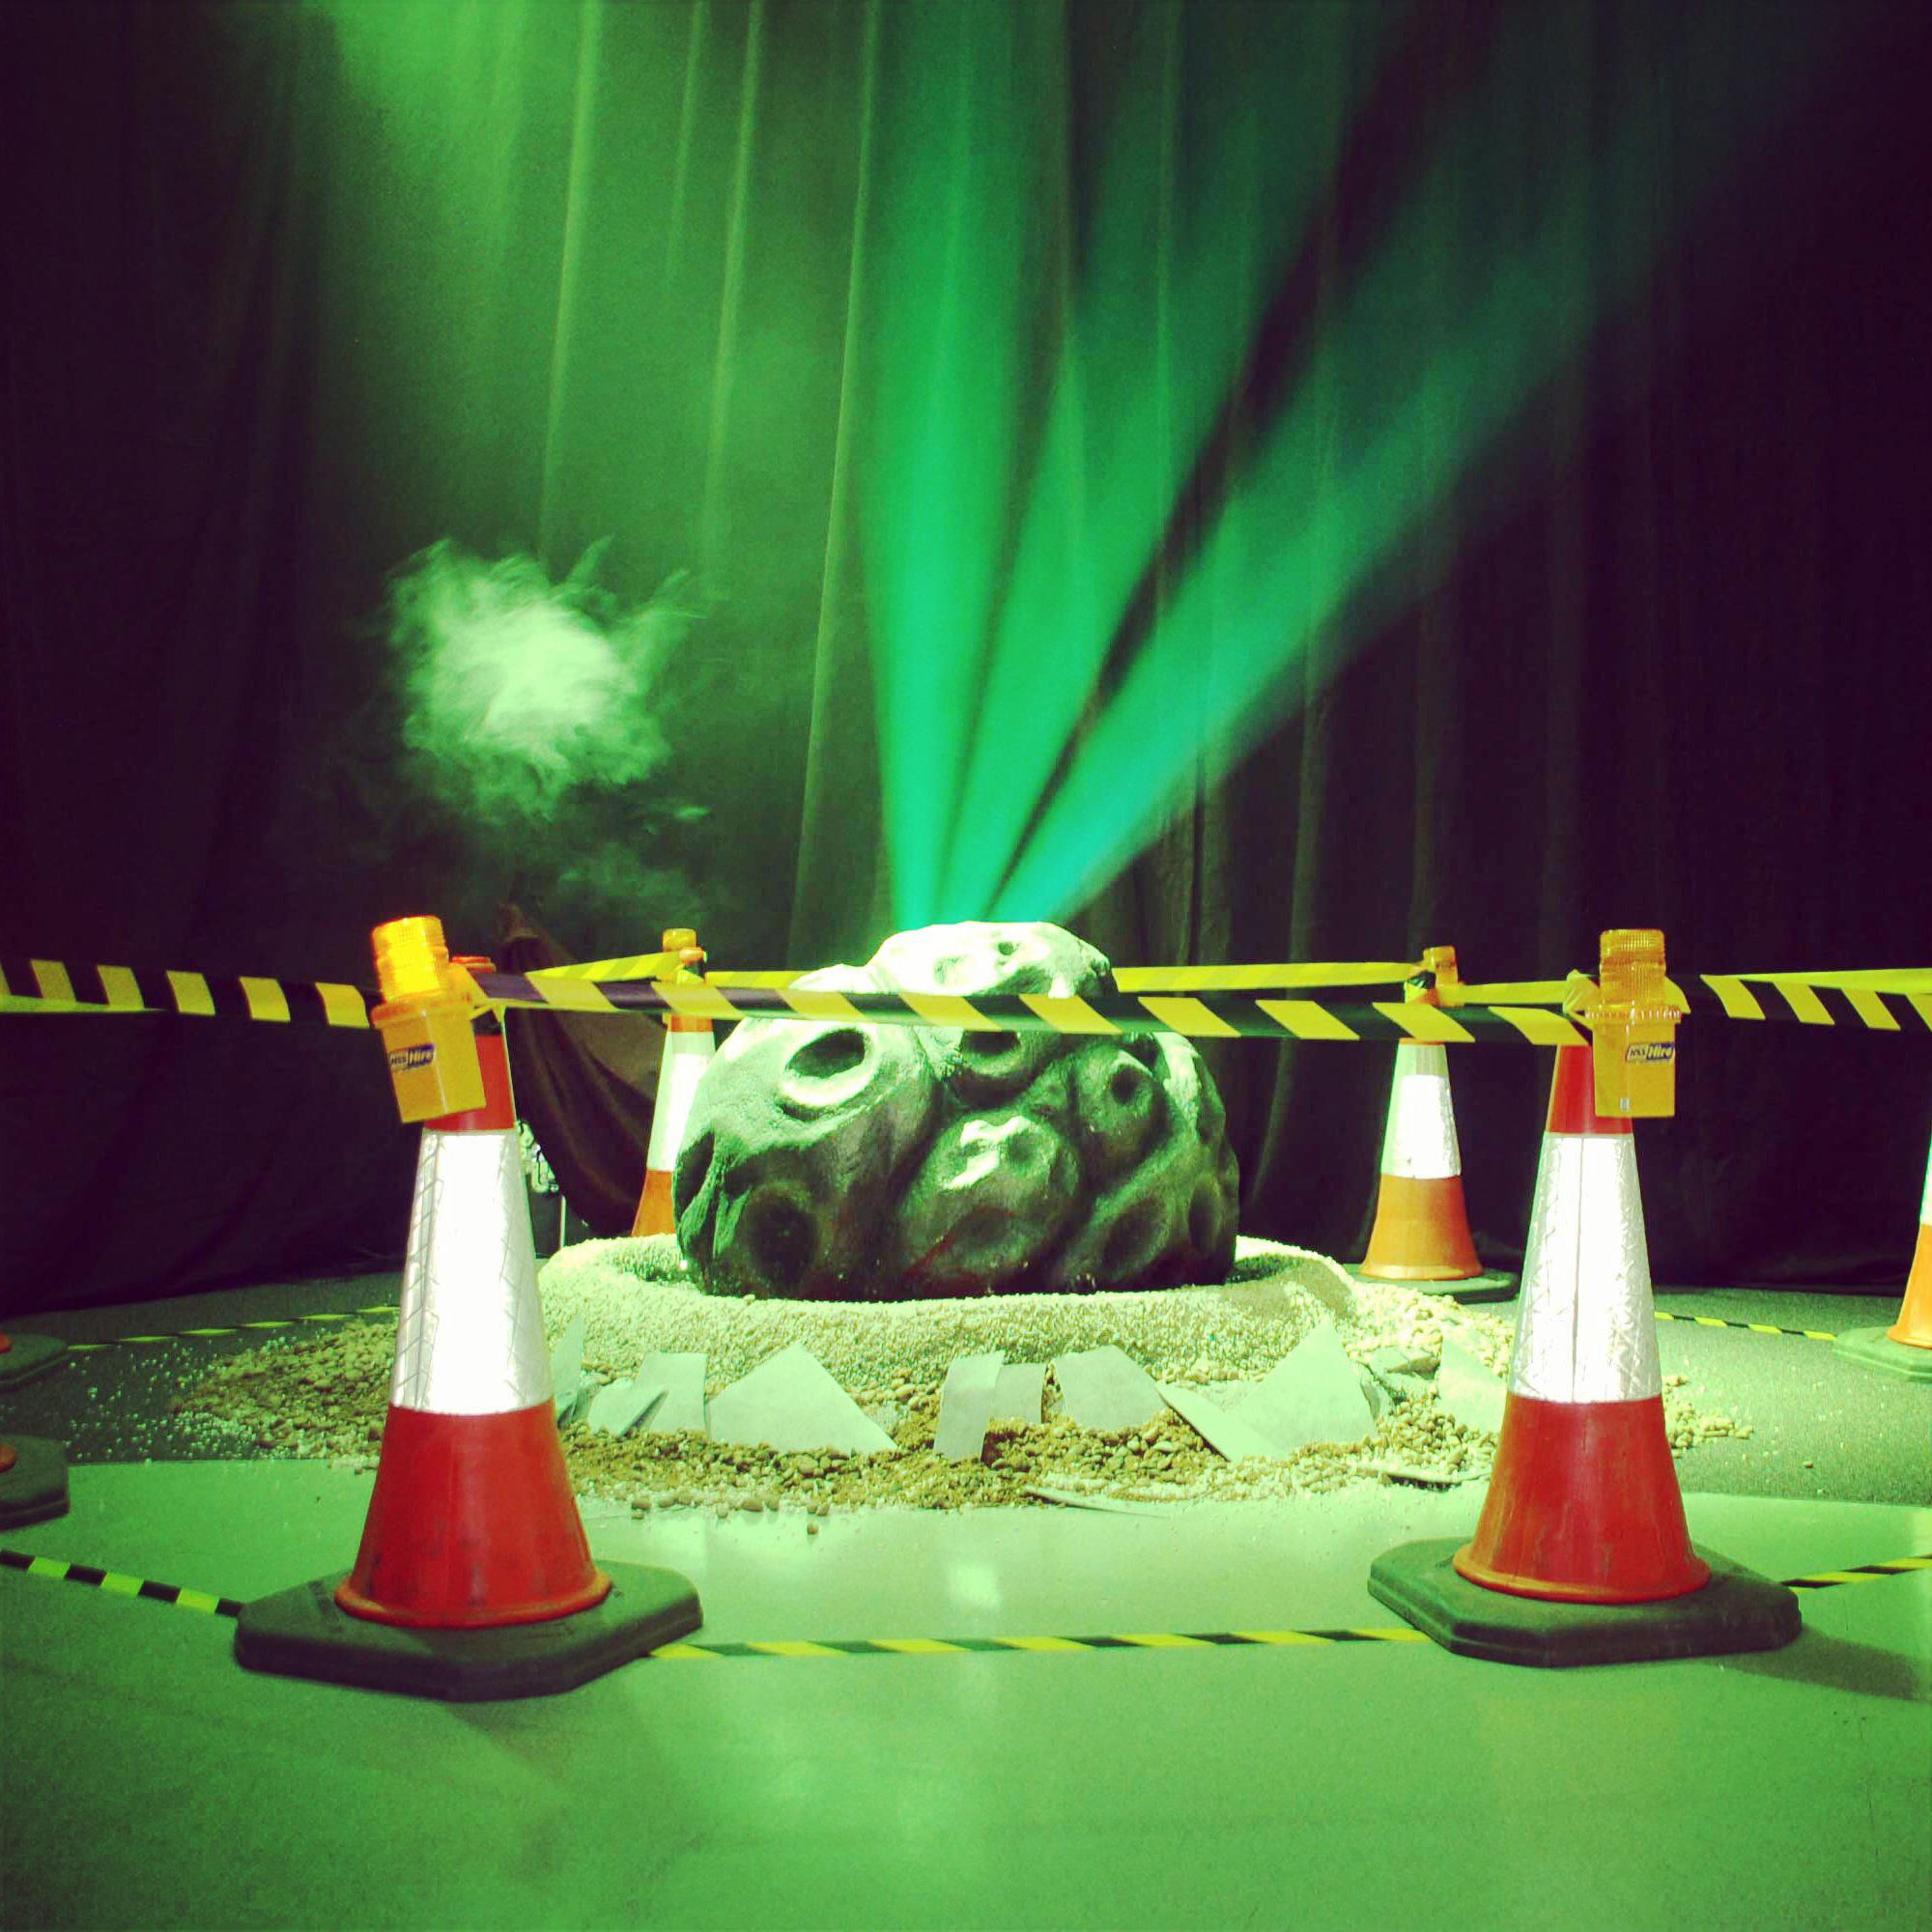 meteorite has landed 3D prop